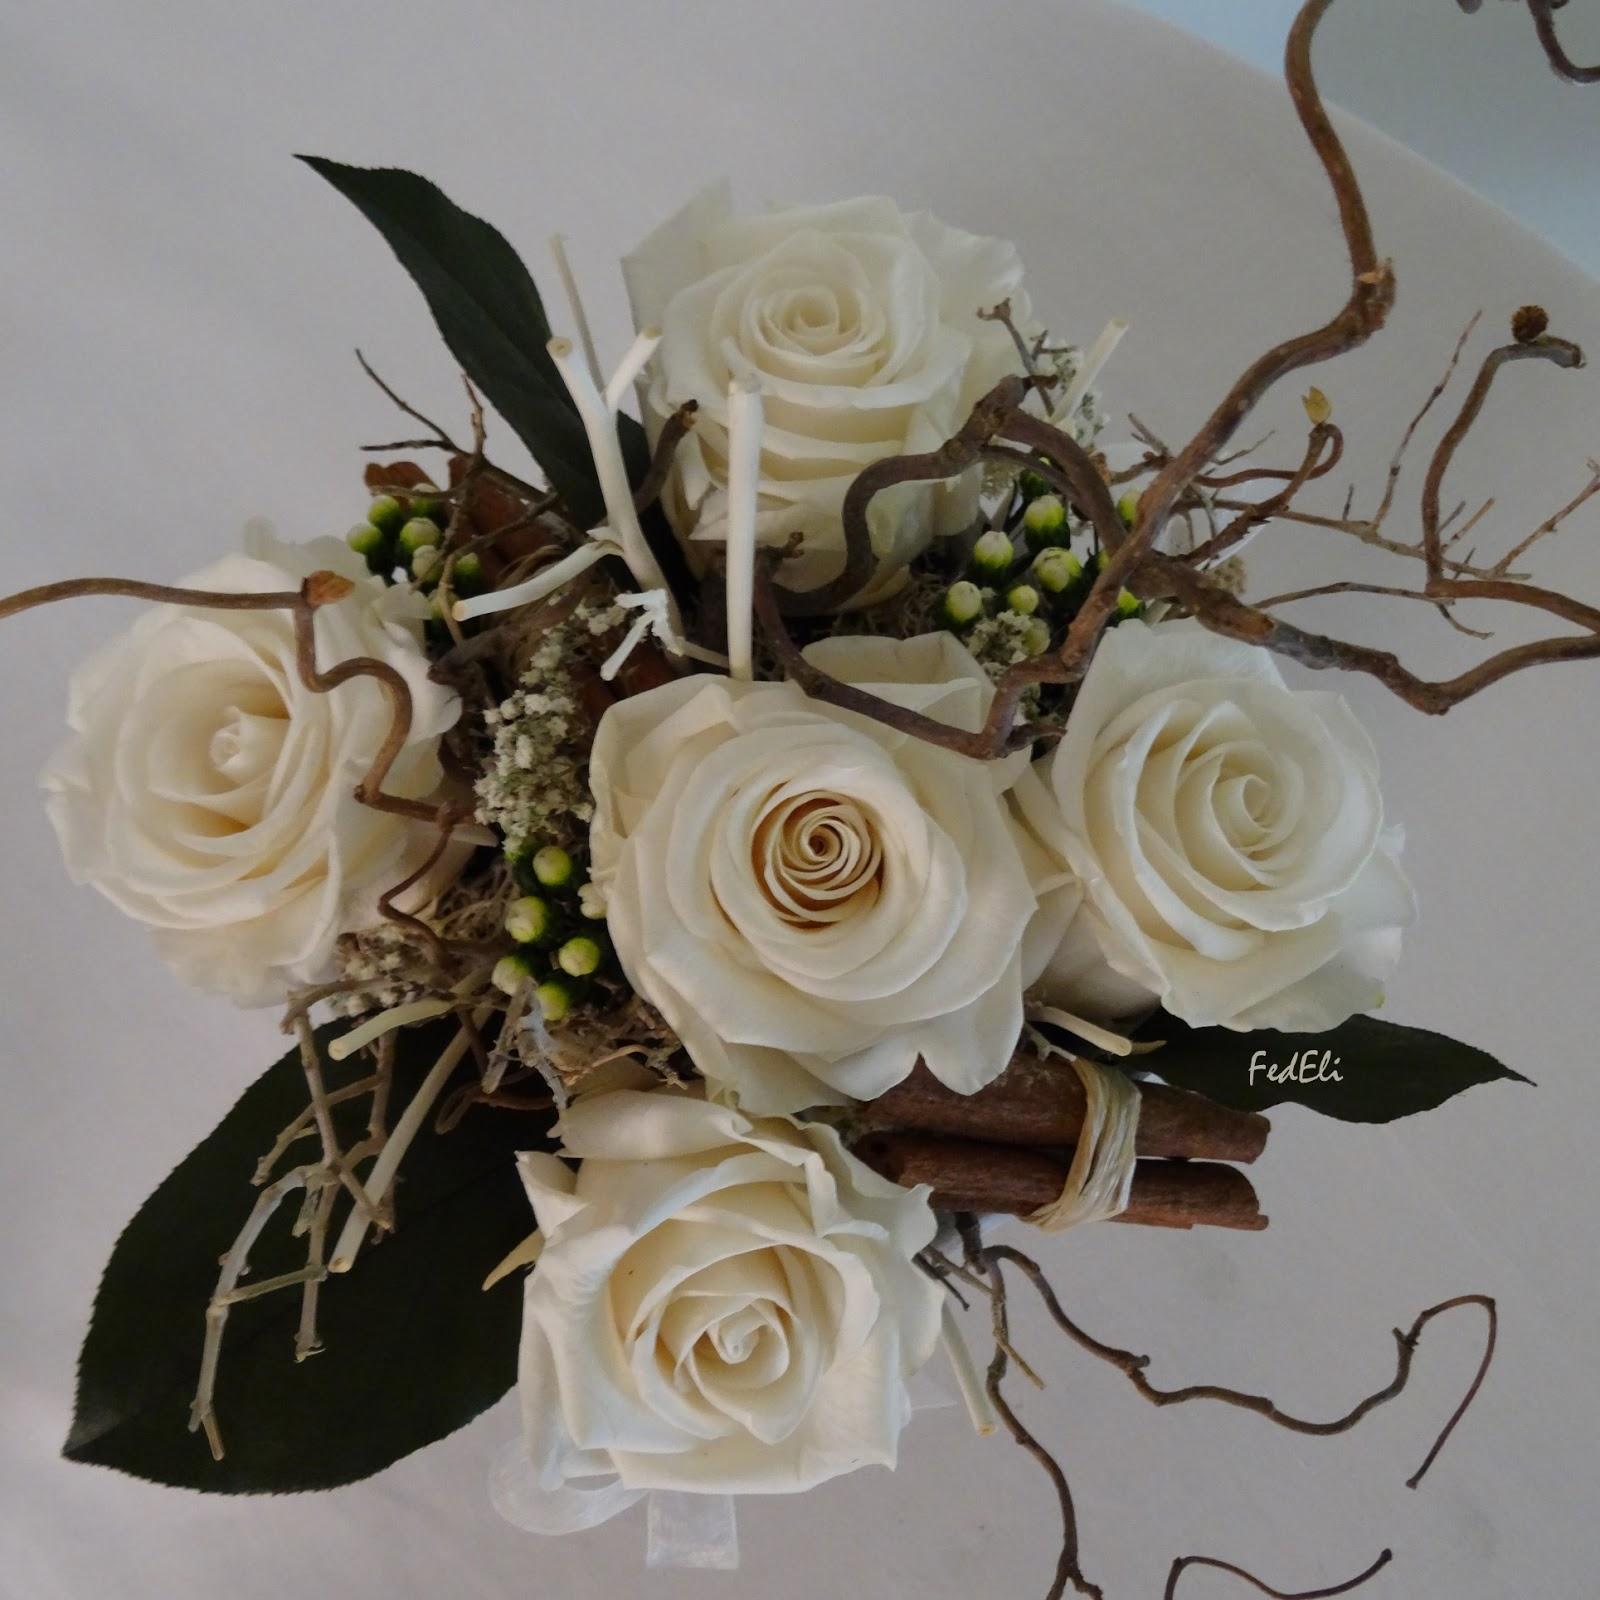 Bomboniera Matrimonio Country Chic : Fiori fedeli flower design lab shabby chic